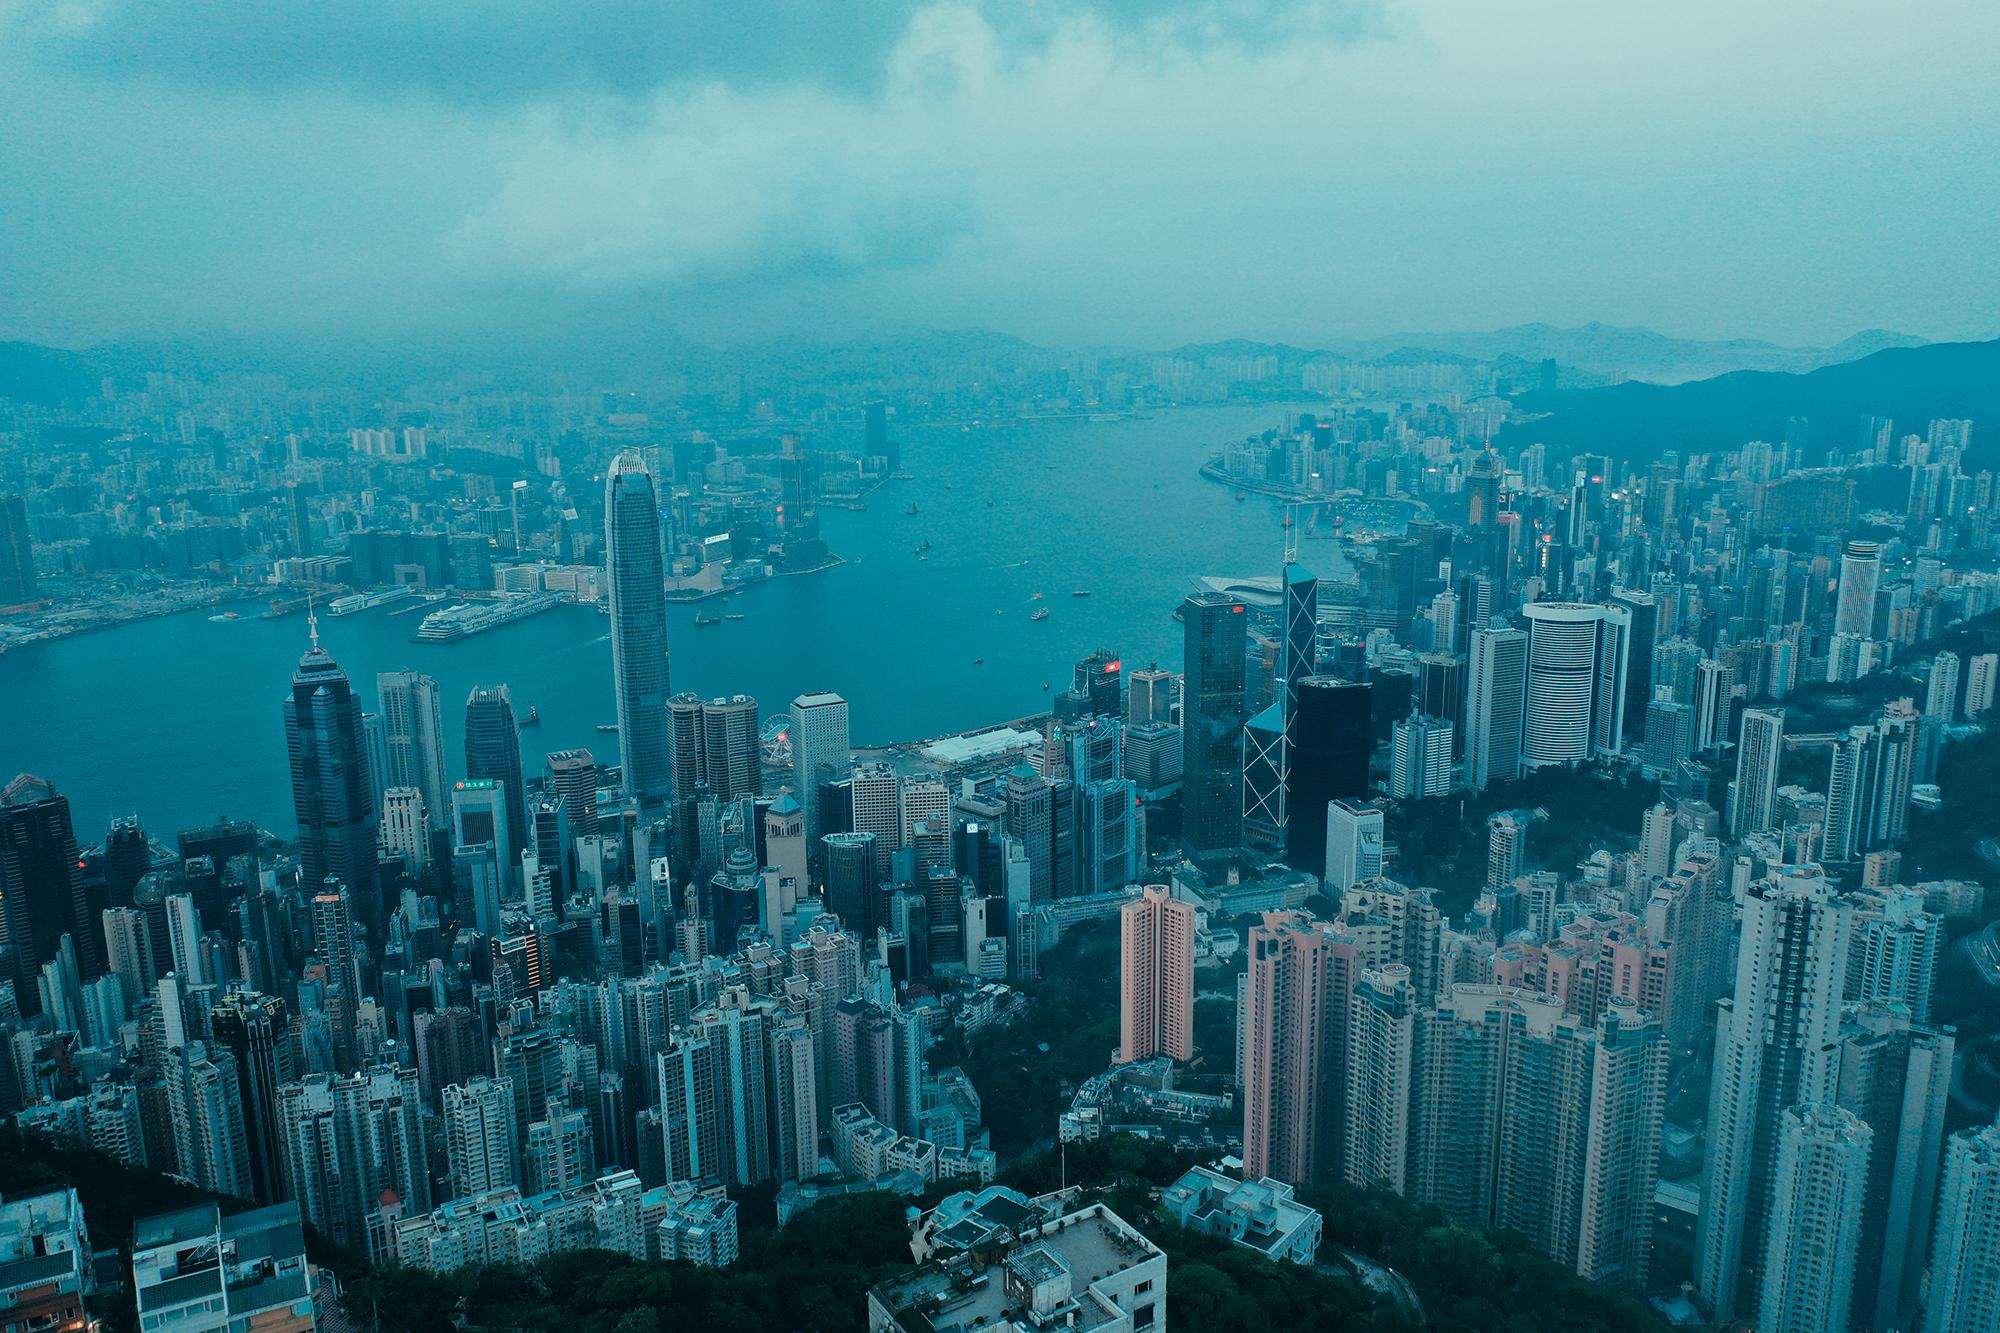 Hong Kong seen from the top of victoria Peak - Copyrights belong to Karim Shaaban - DJI Mavi Pro 2